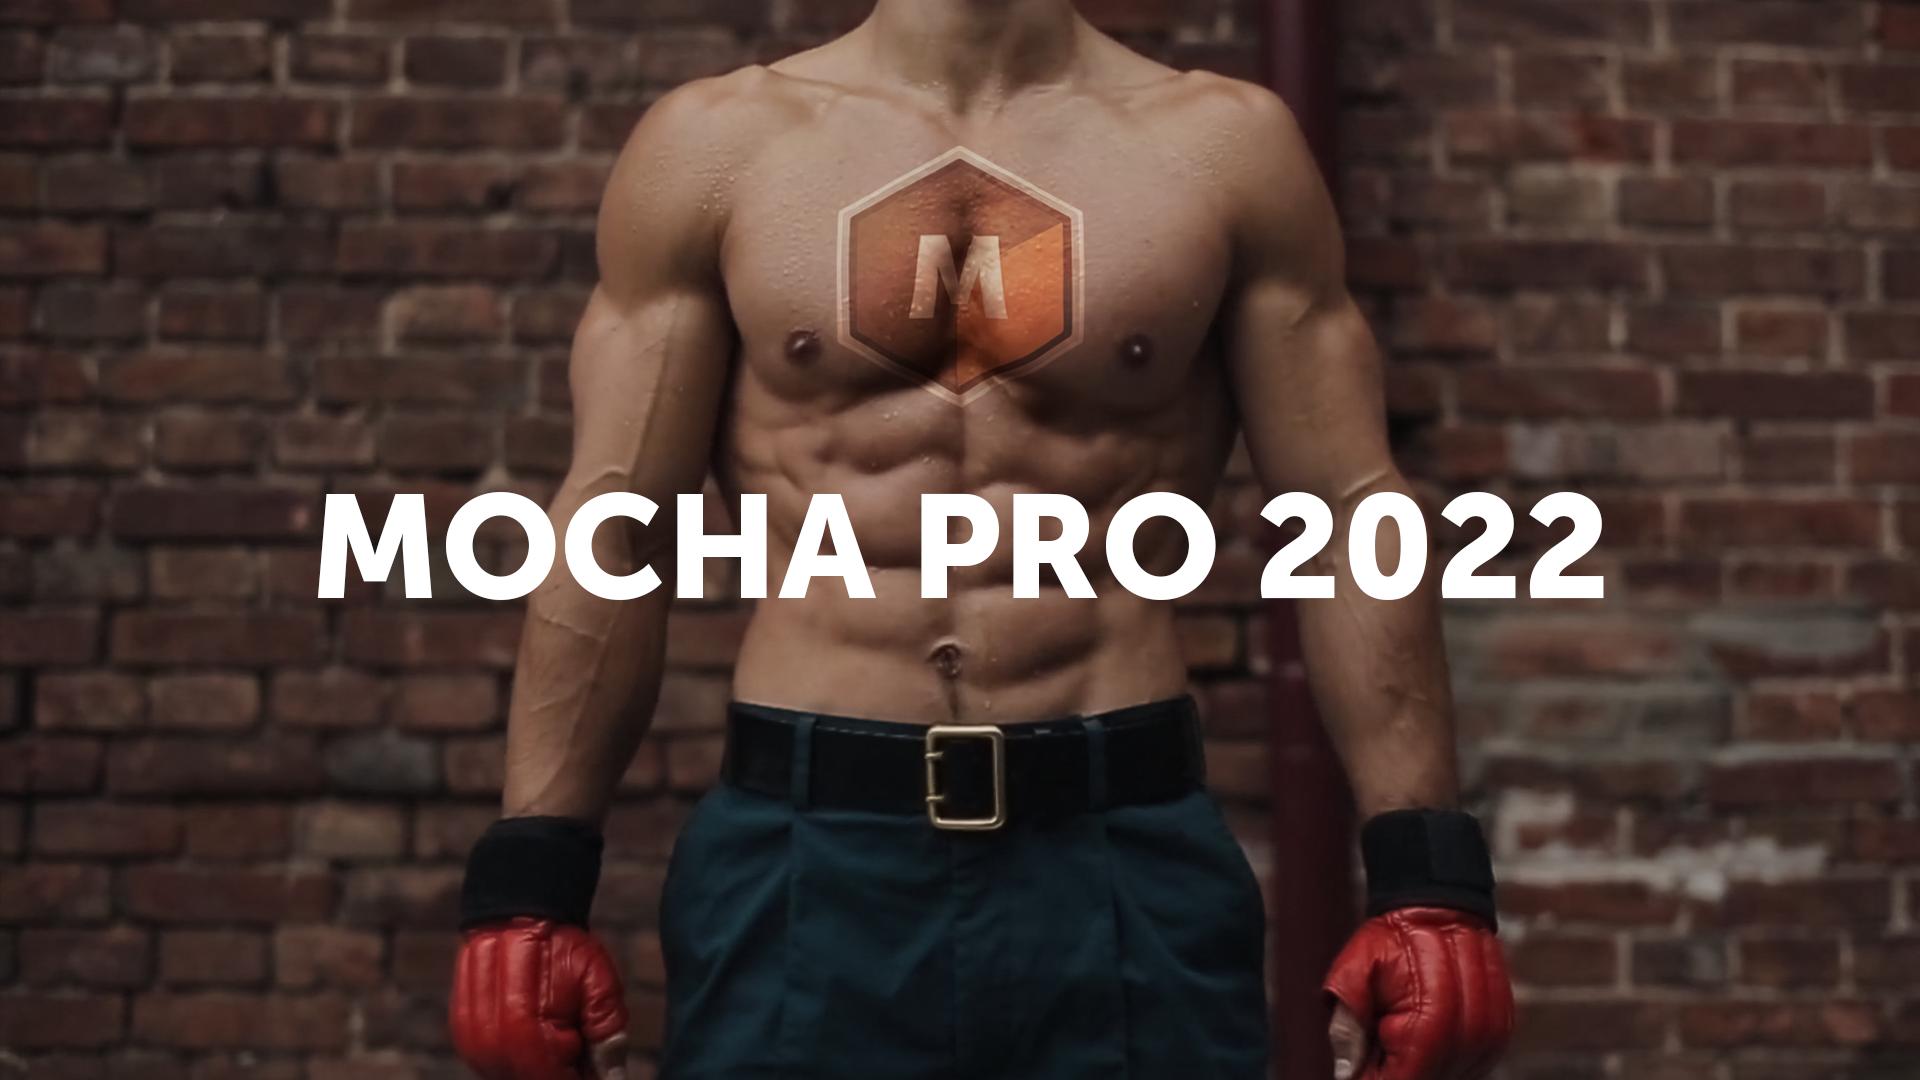 Mocha Pro 2022 hero image with boxer